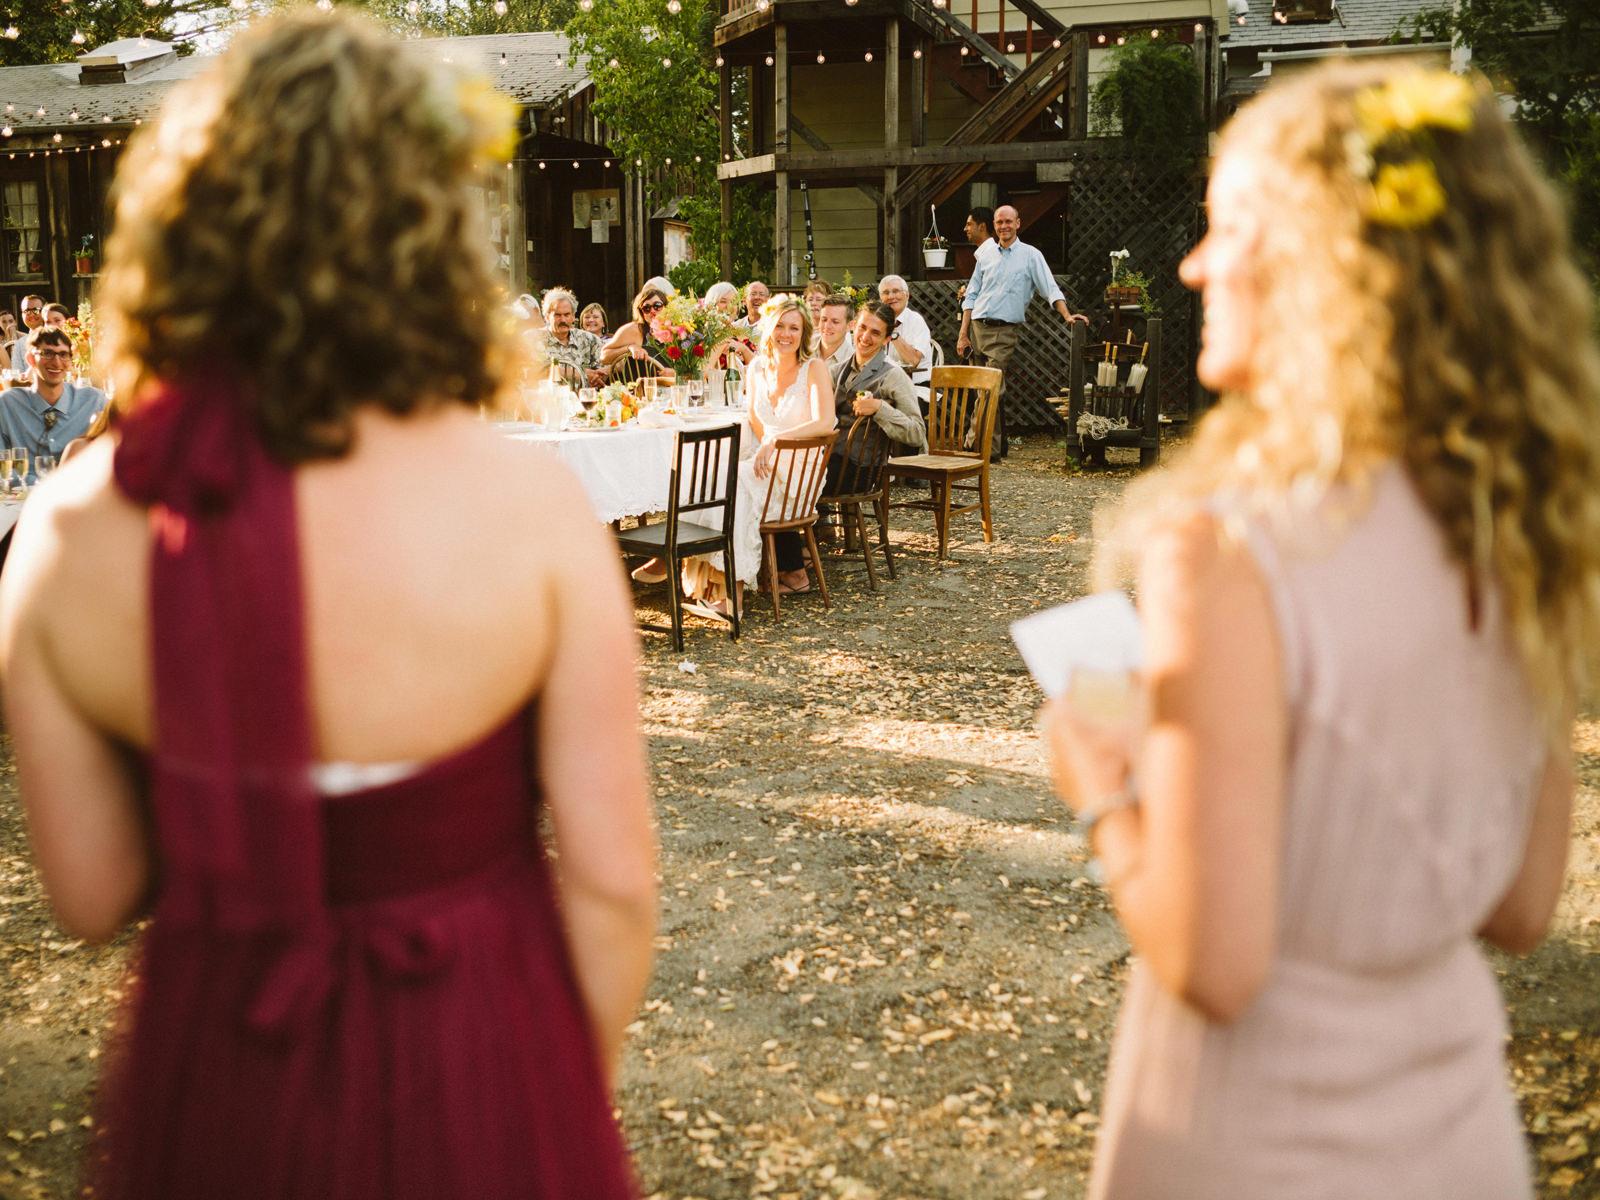 rivers-bend-retreat-wedding-083 RIVER'S BEND RETREAT WEDDING